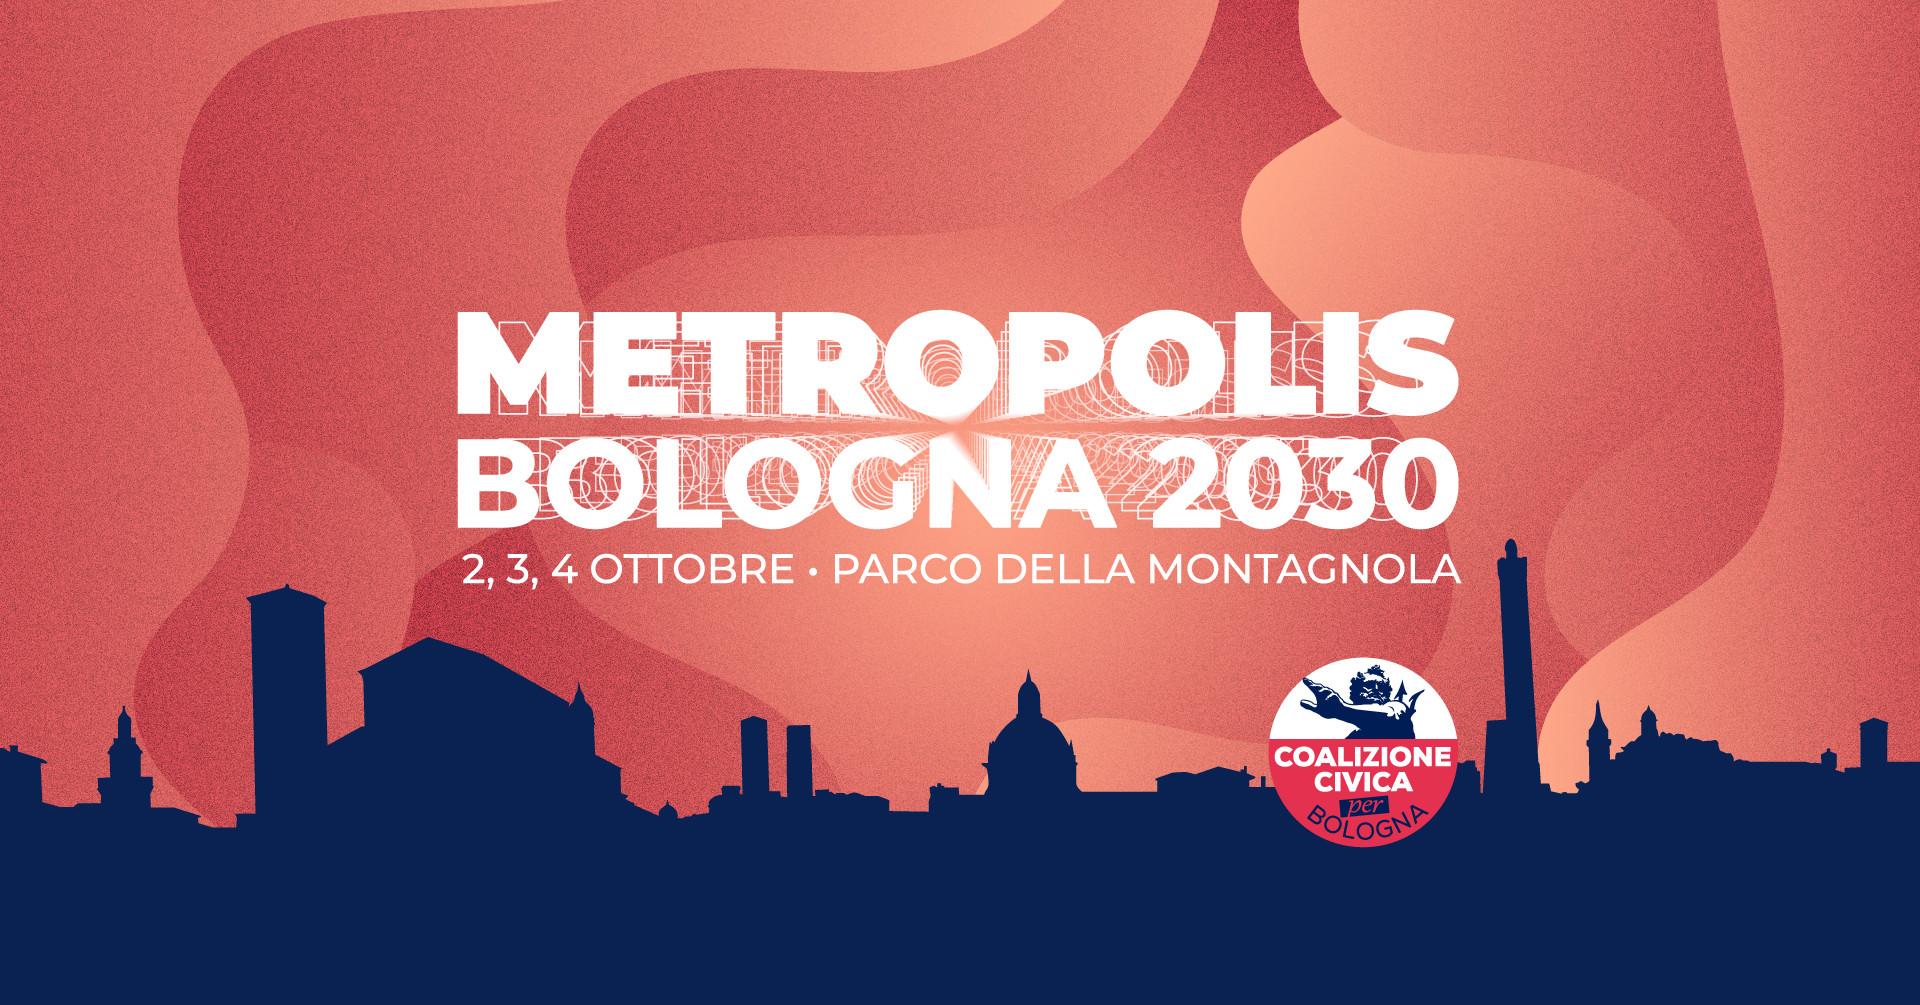 METROPOLIS, Bologna 2030 – 2, 3, 4 ottobre Parco della Montagnola